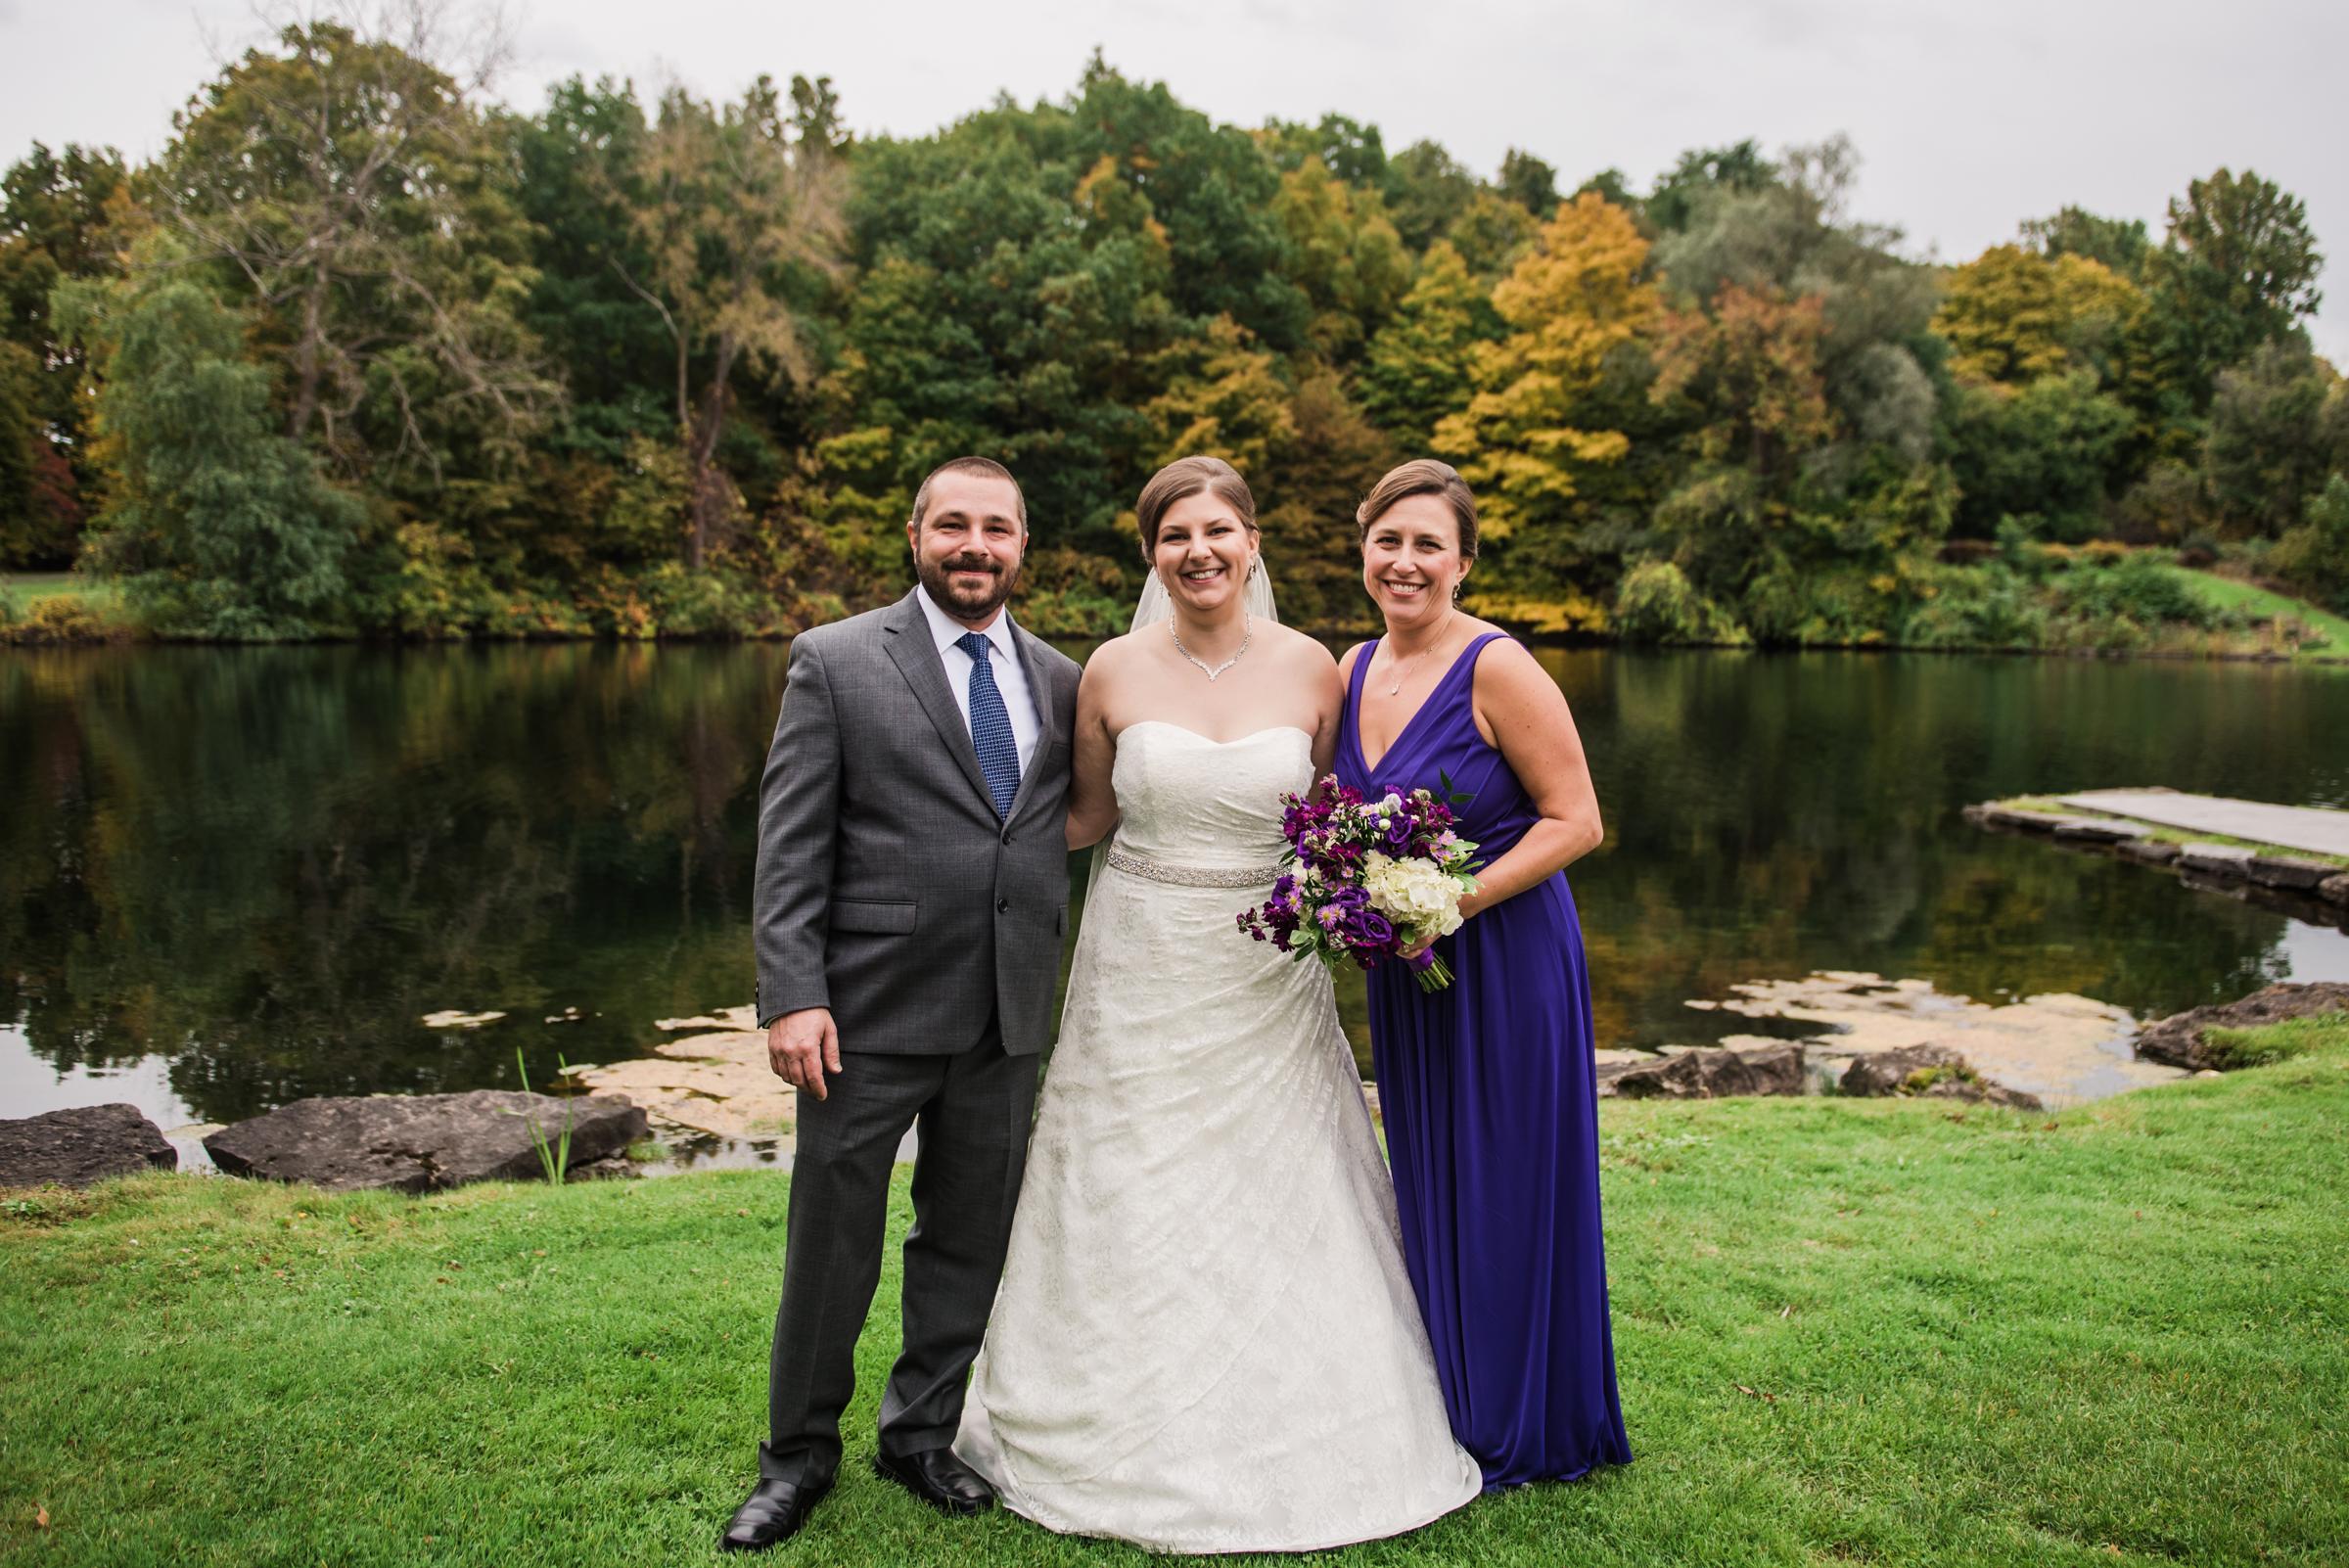 Shadow_Lake_Rochester_Wedding_JILL_STUDIO_Rochester_NY_Photographer_DSC_5592.jpg